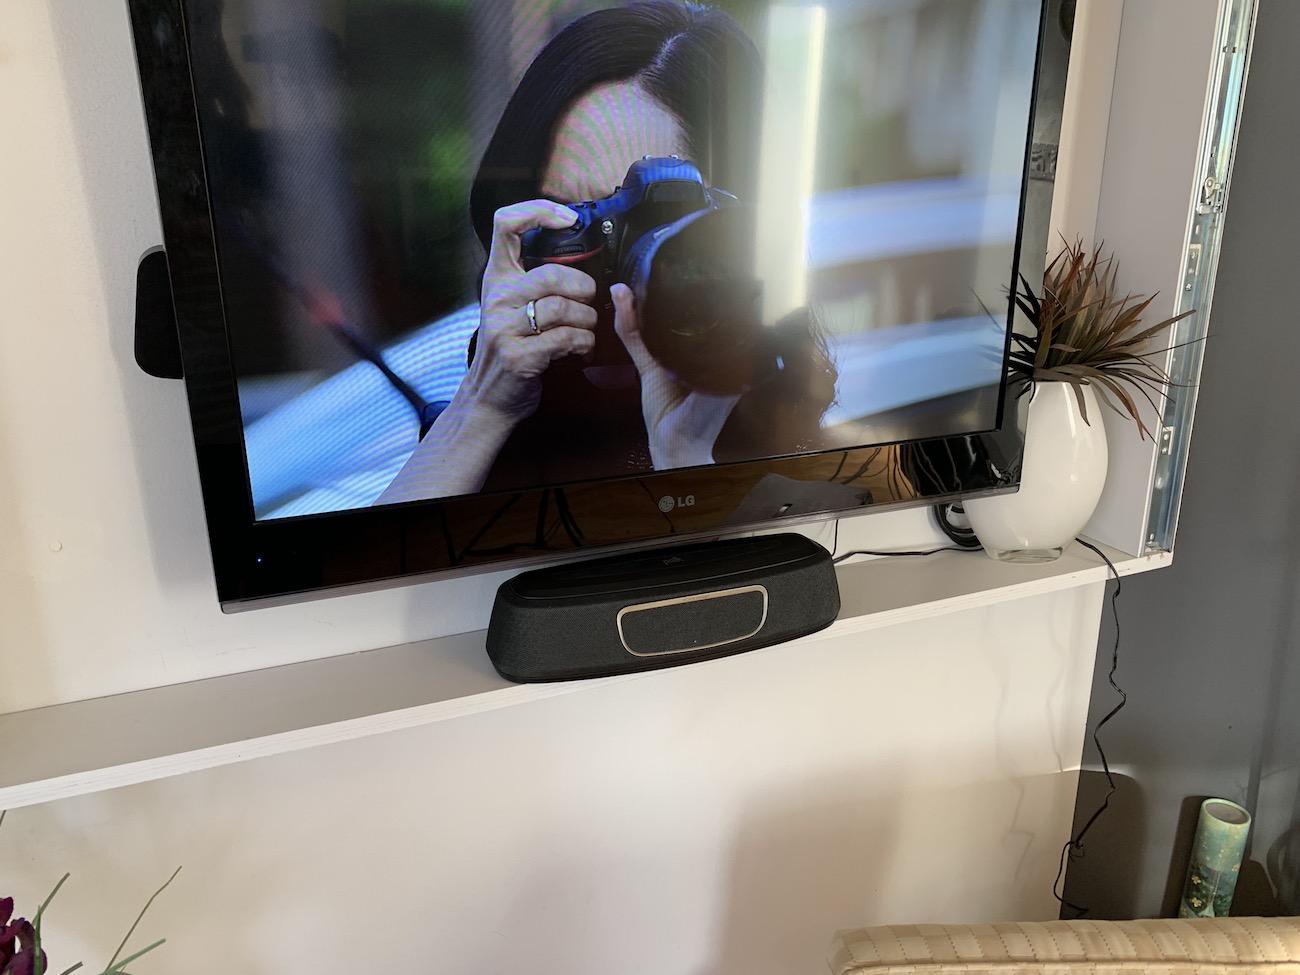 Polk magnifi mini sound bar sub review